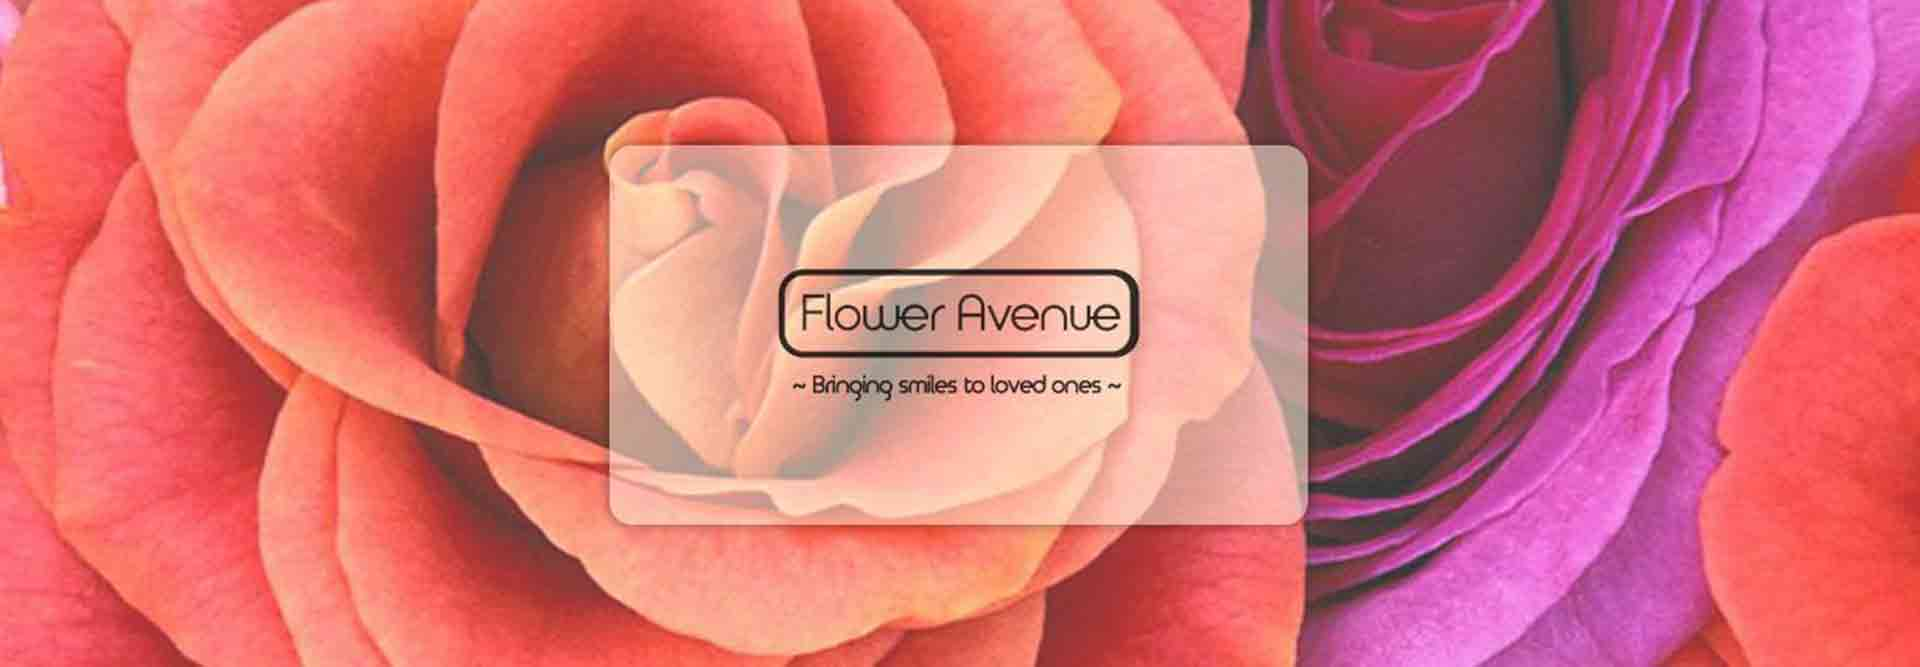 flower-avenue-ban